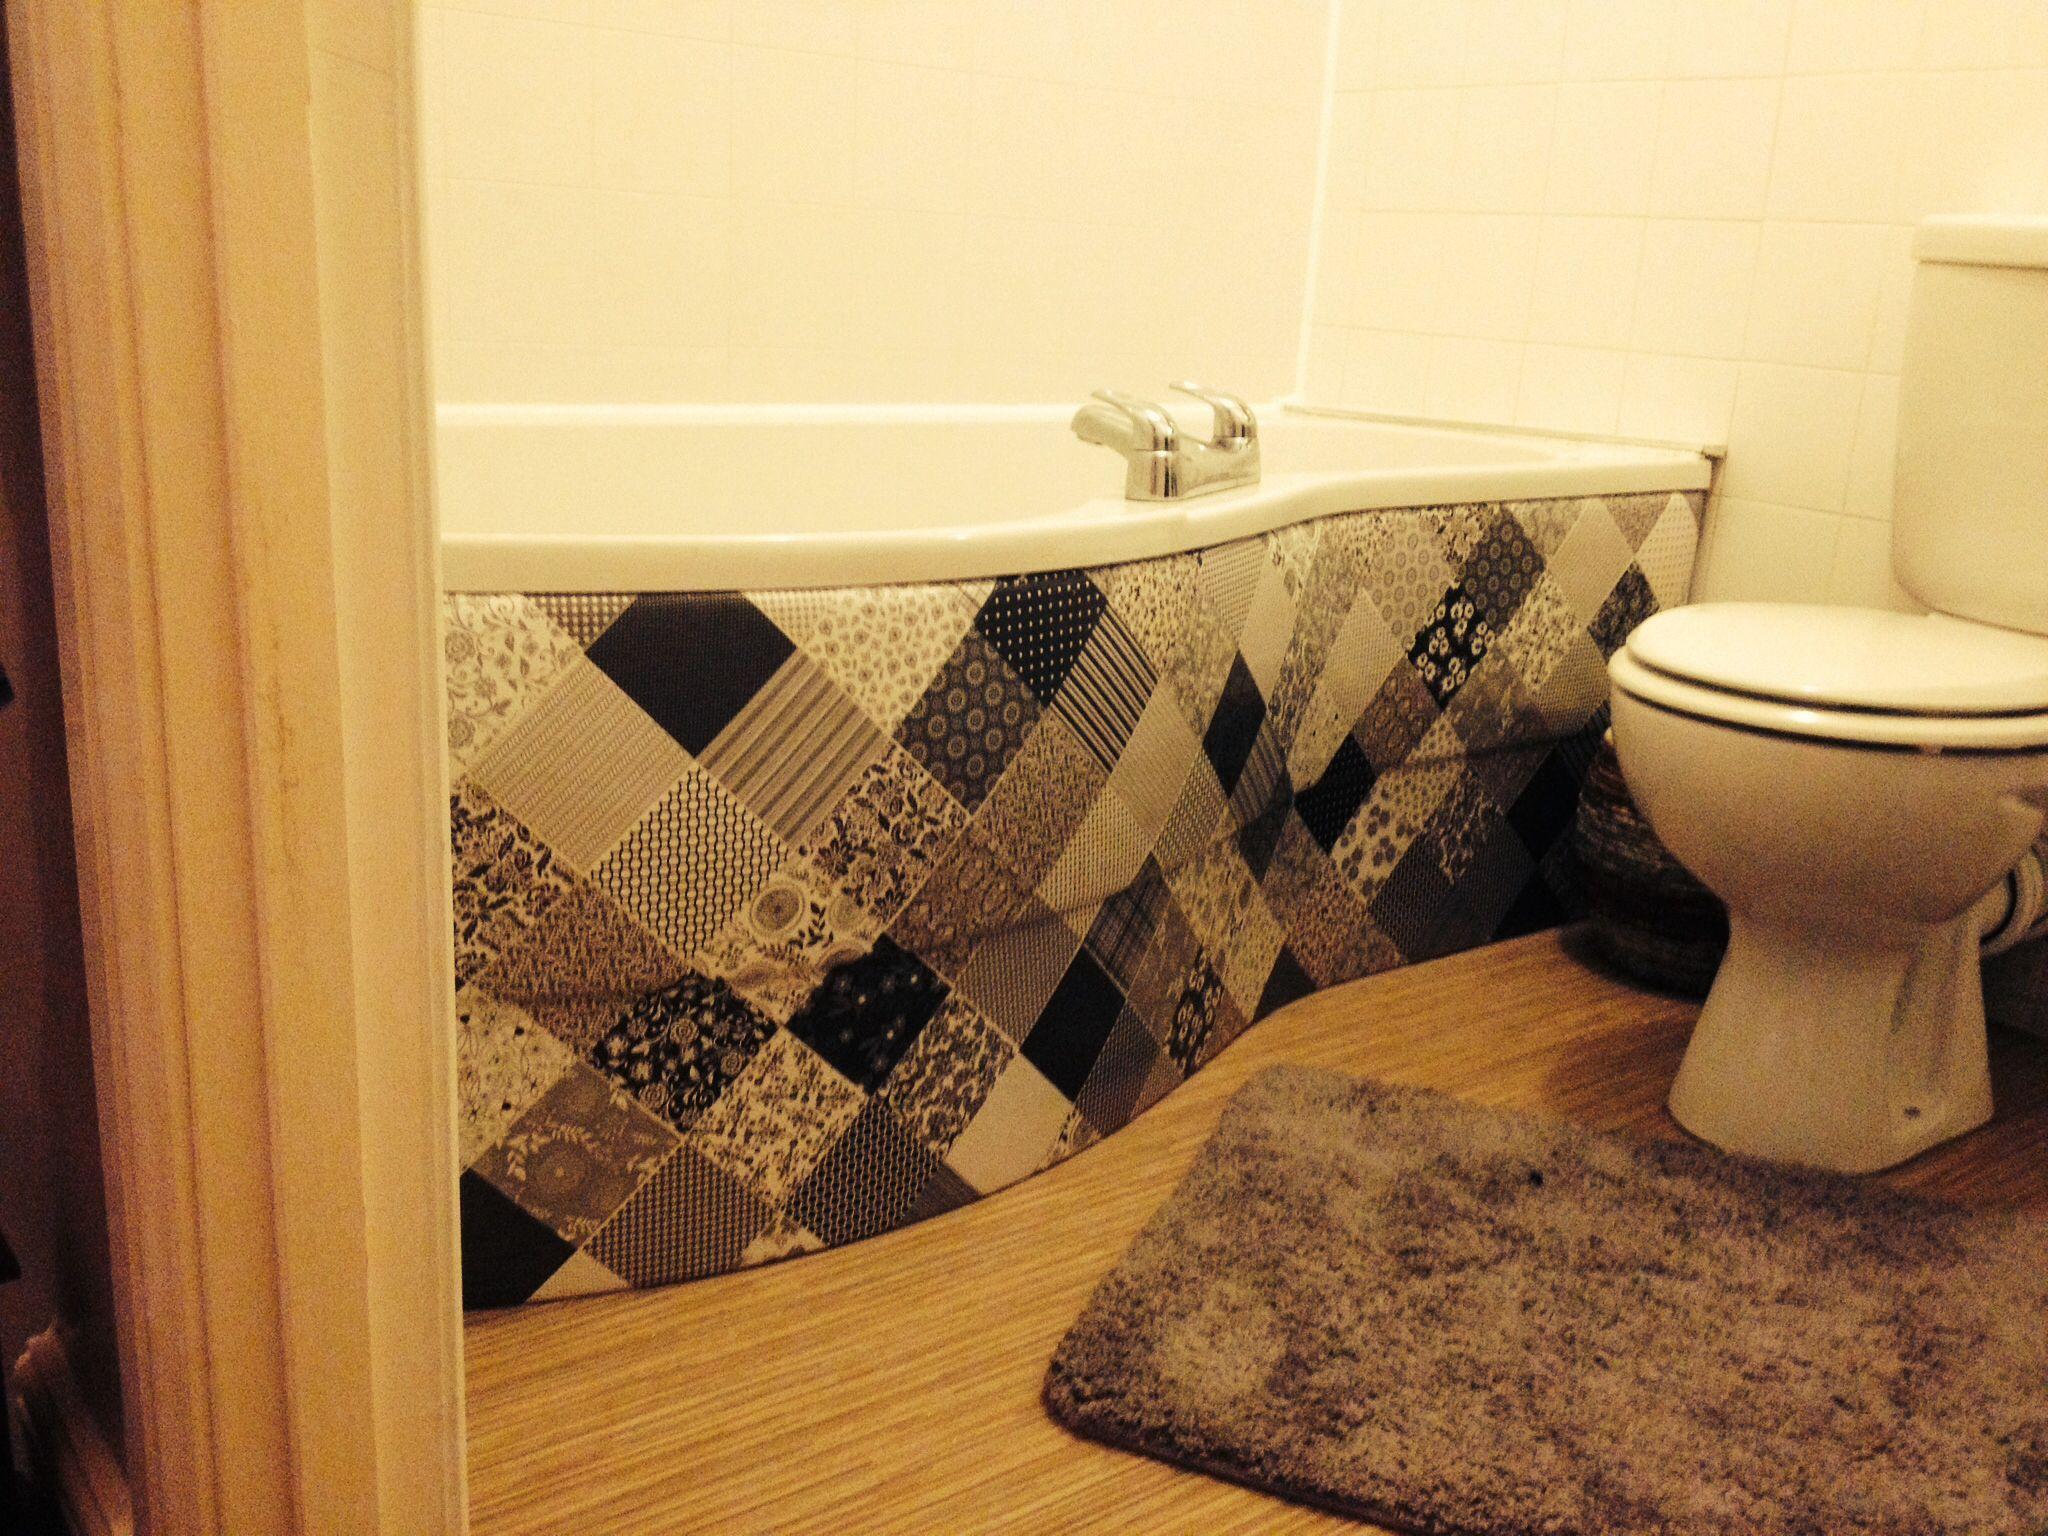 Decoupage bath panel